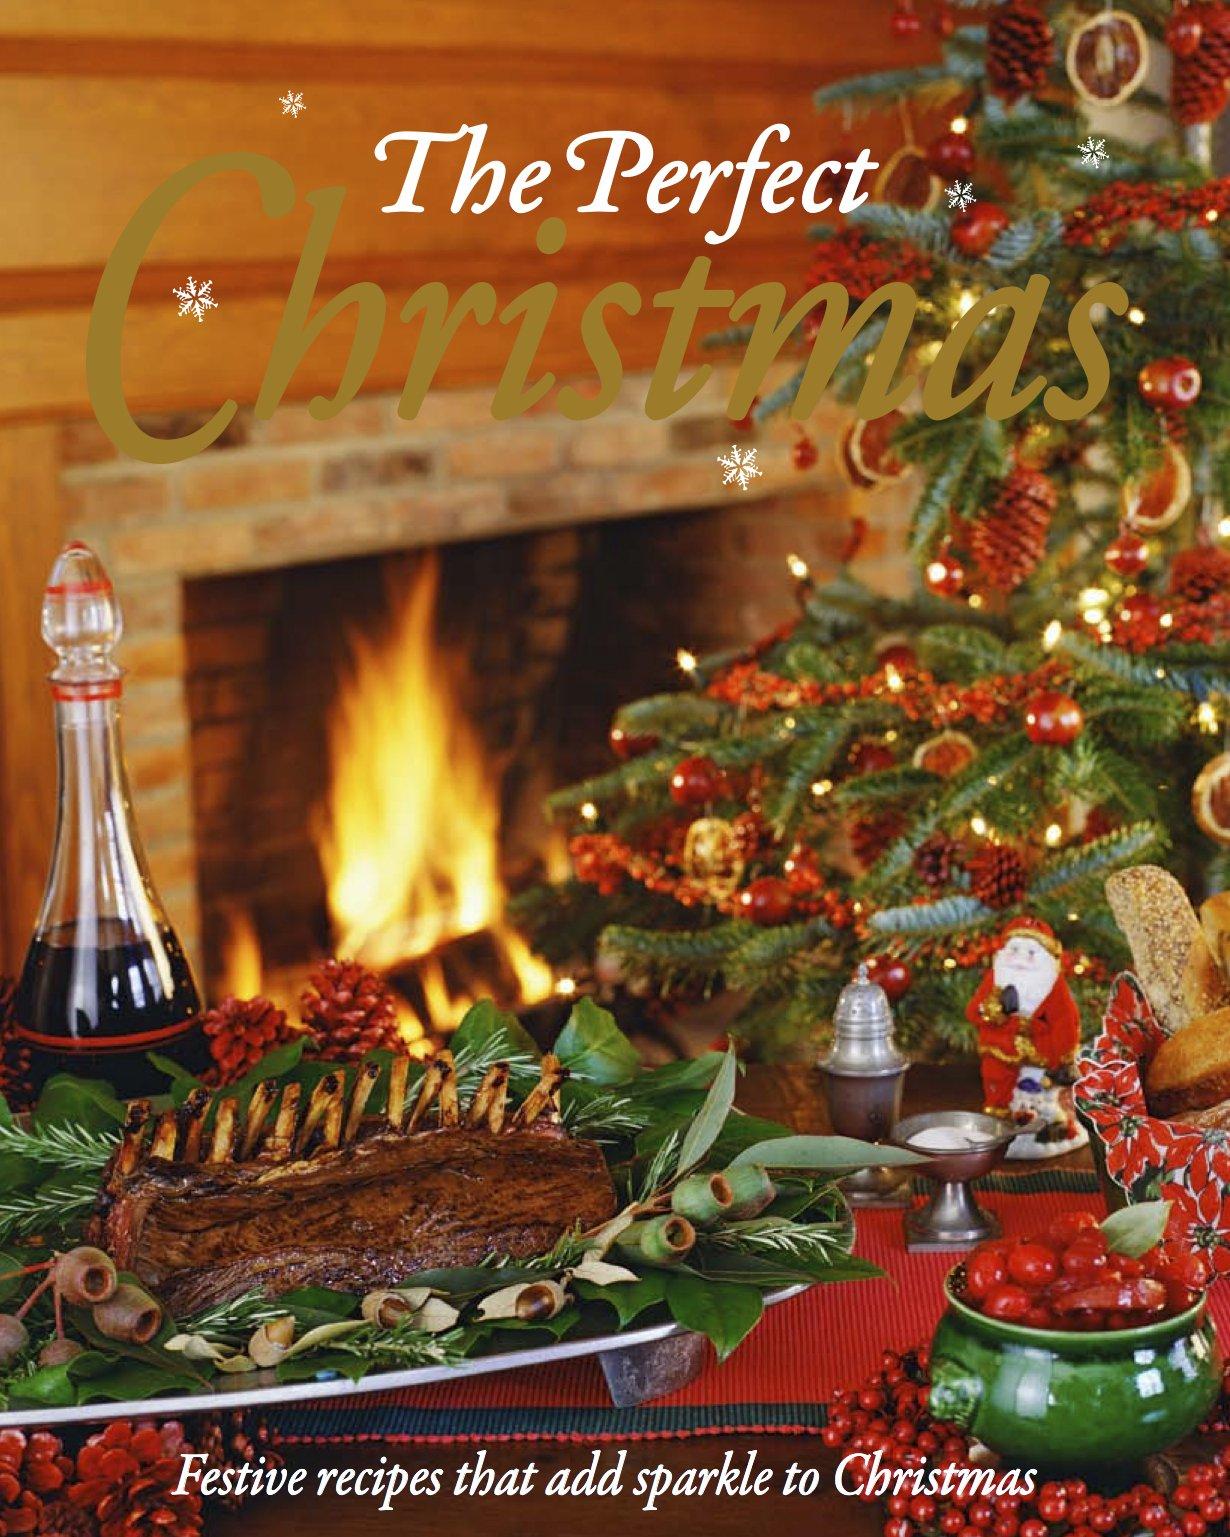 THE PERFECT CHRISTMAS pdf